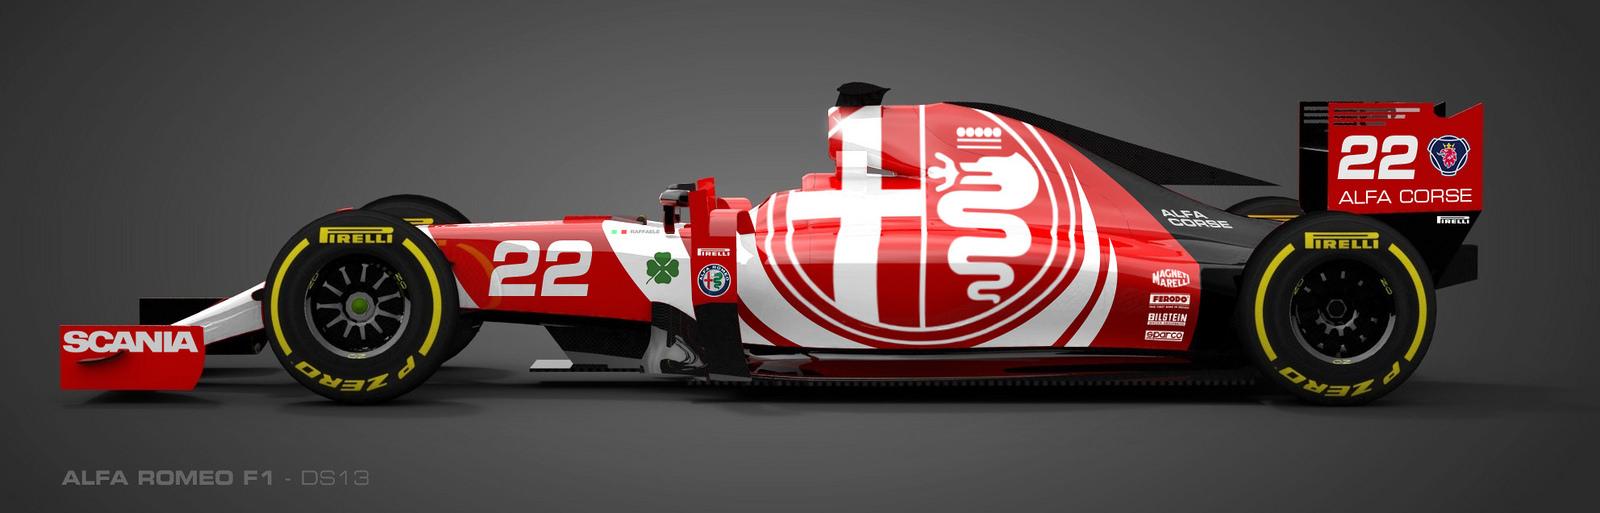 alfa-romeo-f1-car-photos-concept-design2